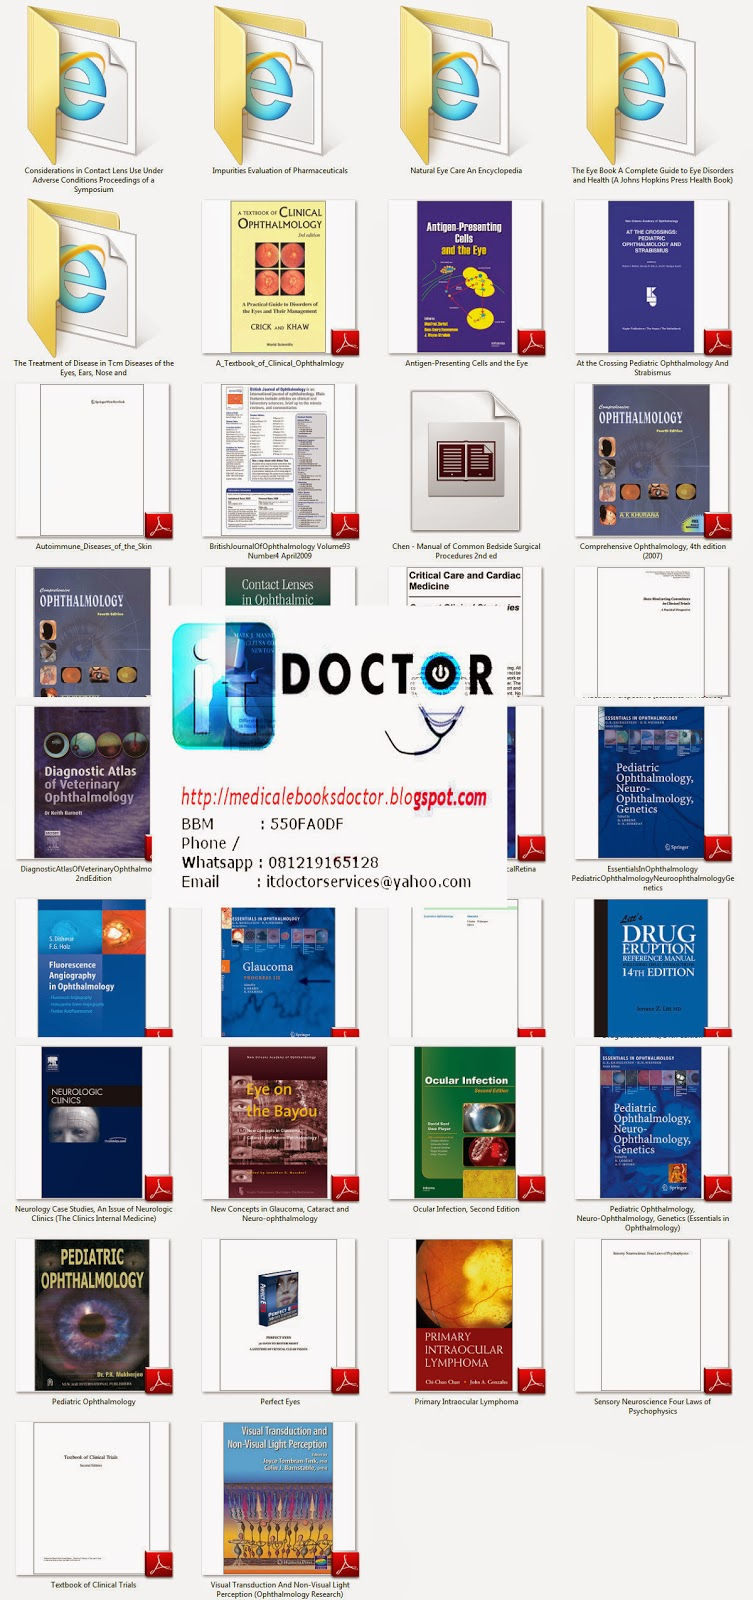 Comprehensive Ophthalmology Pdf